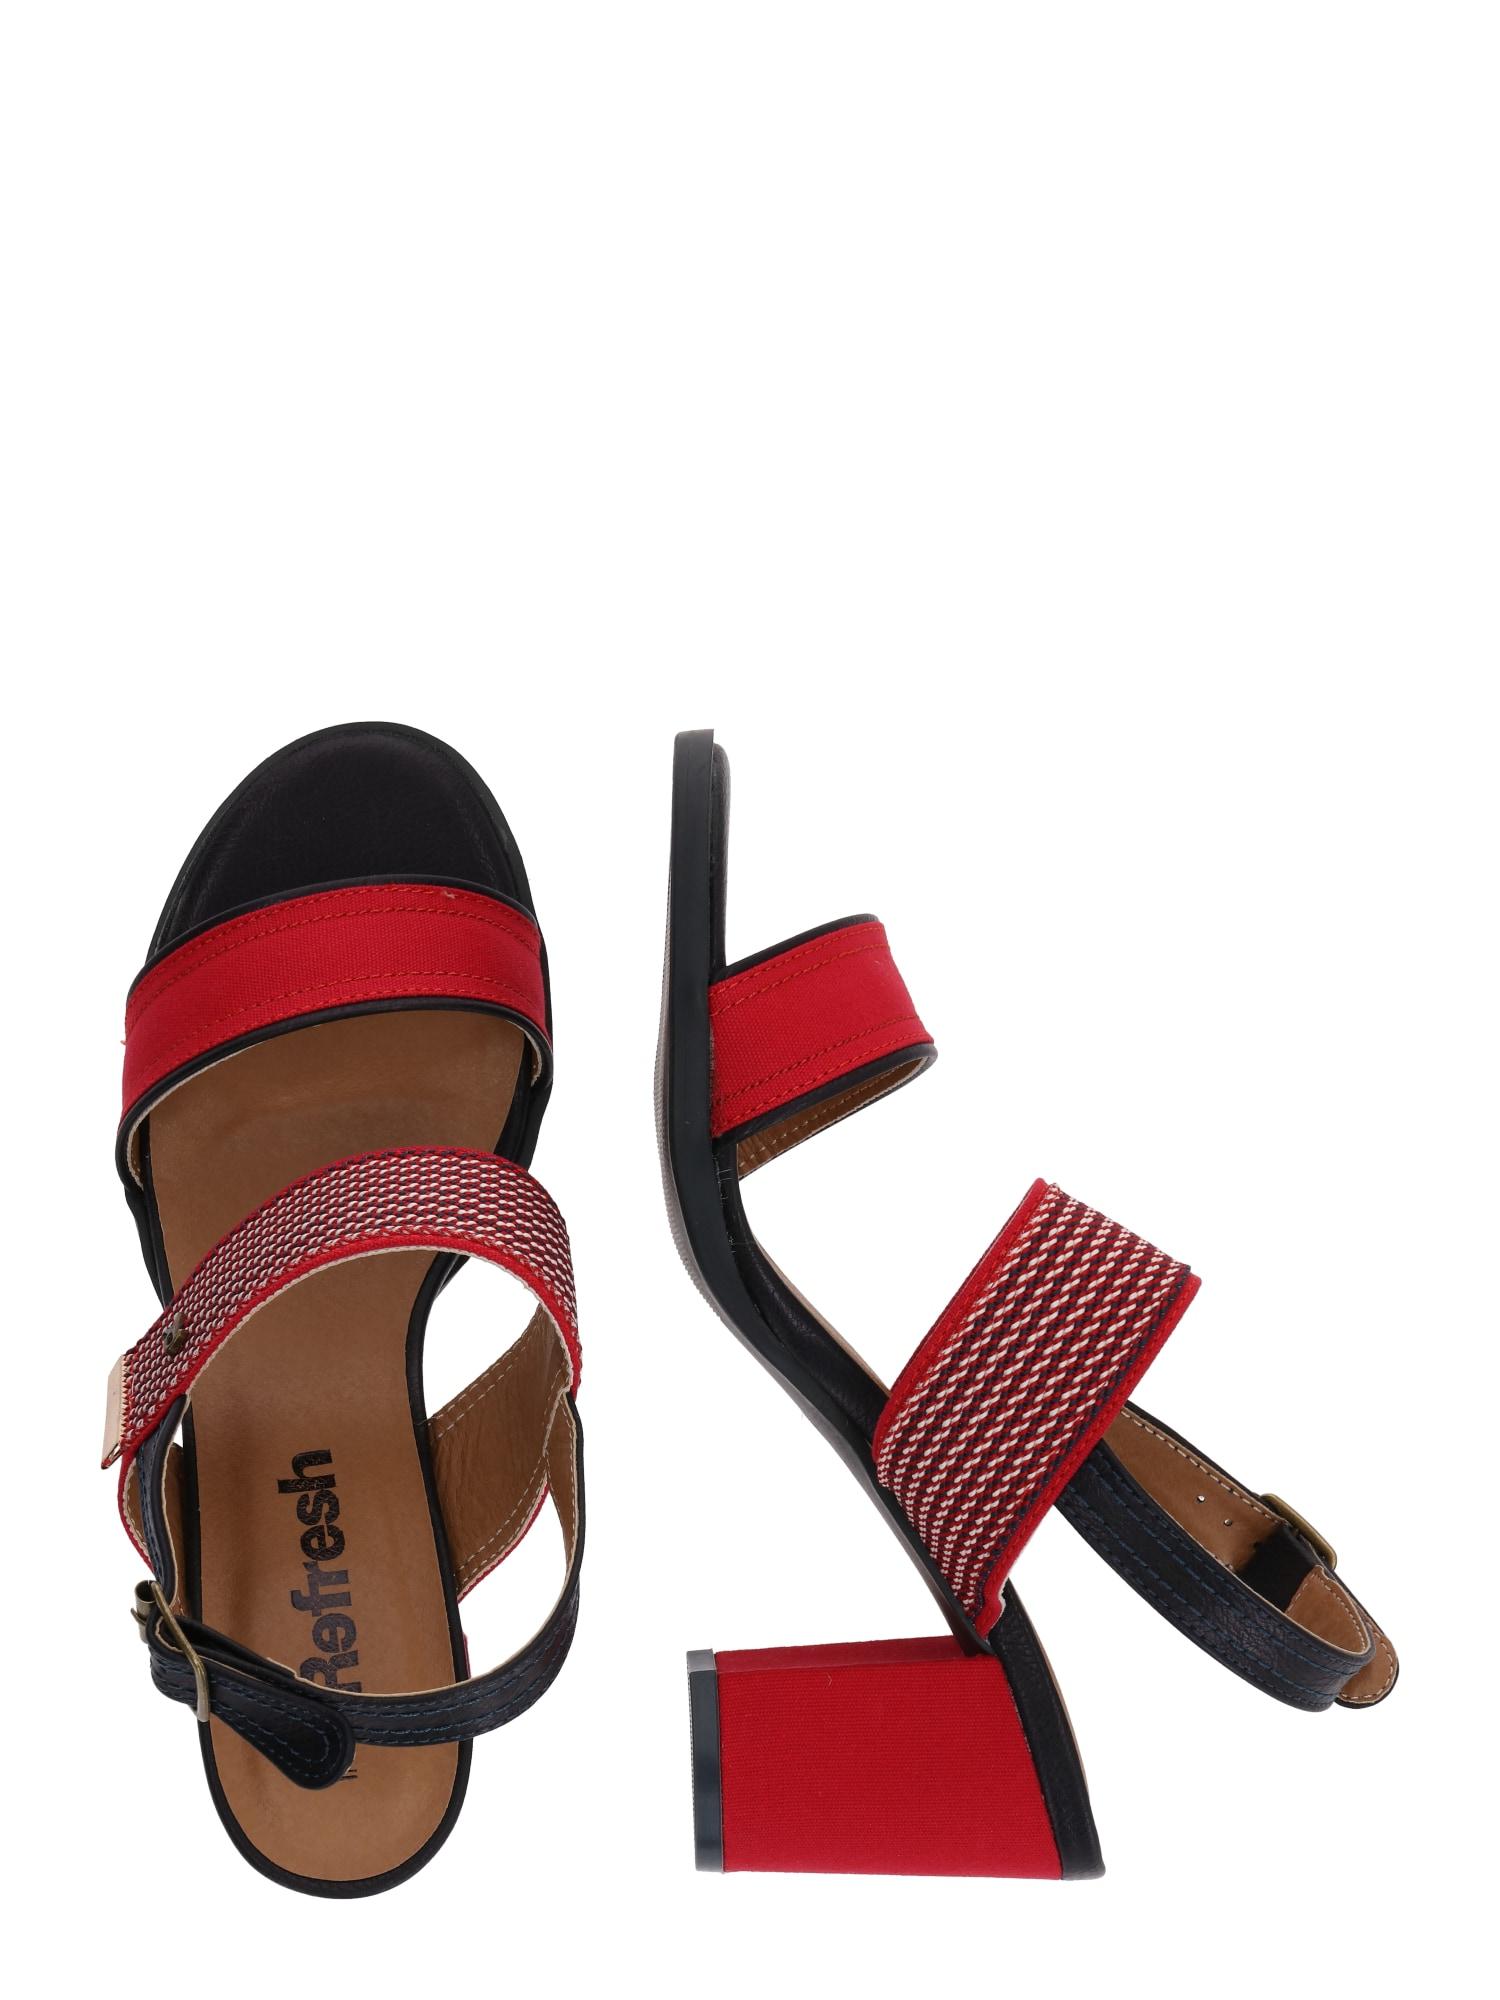 refresh - Sandale